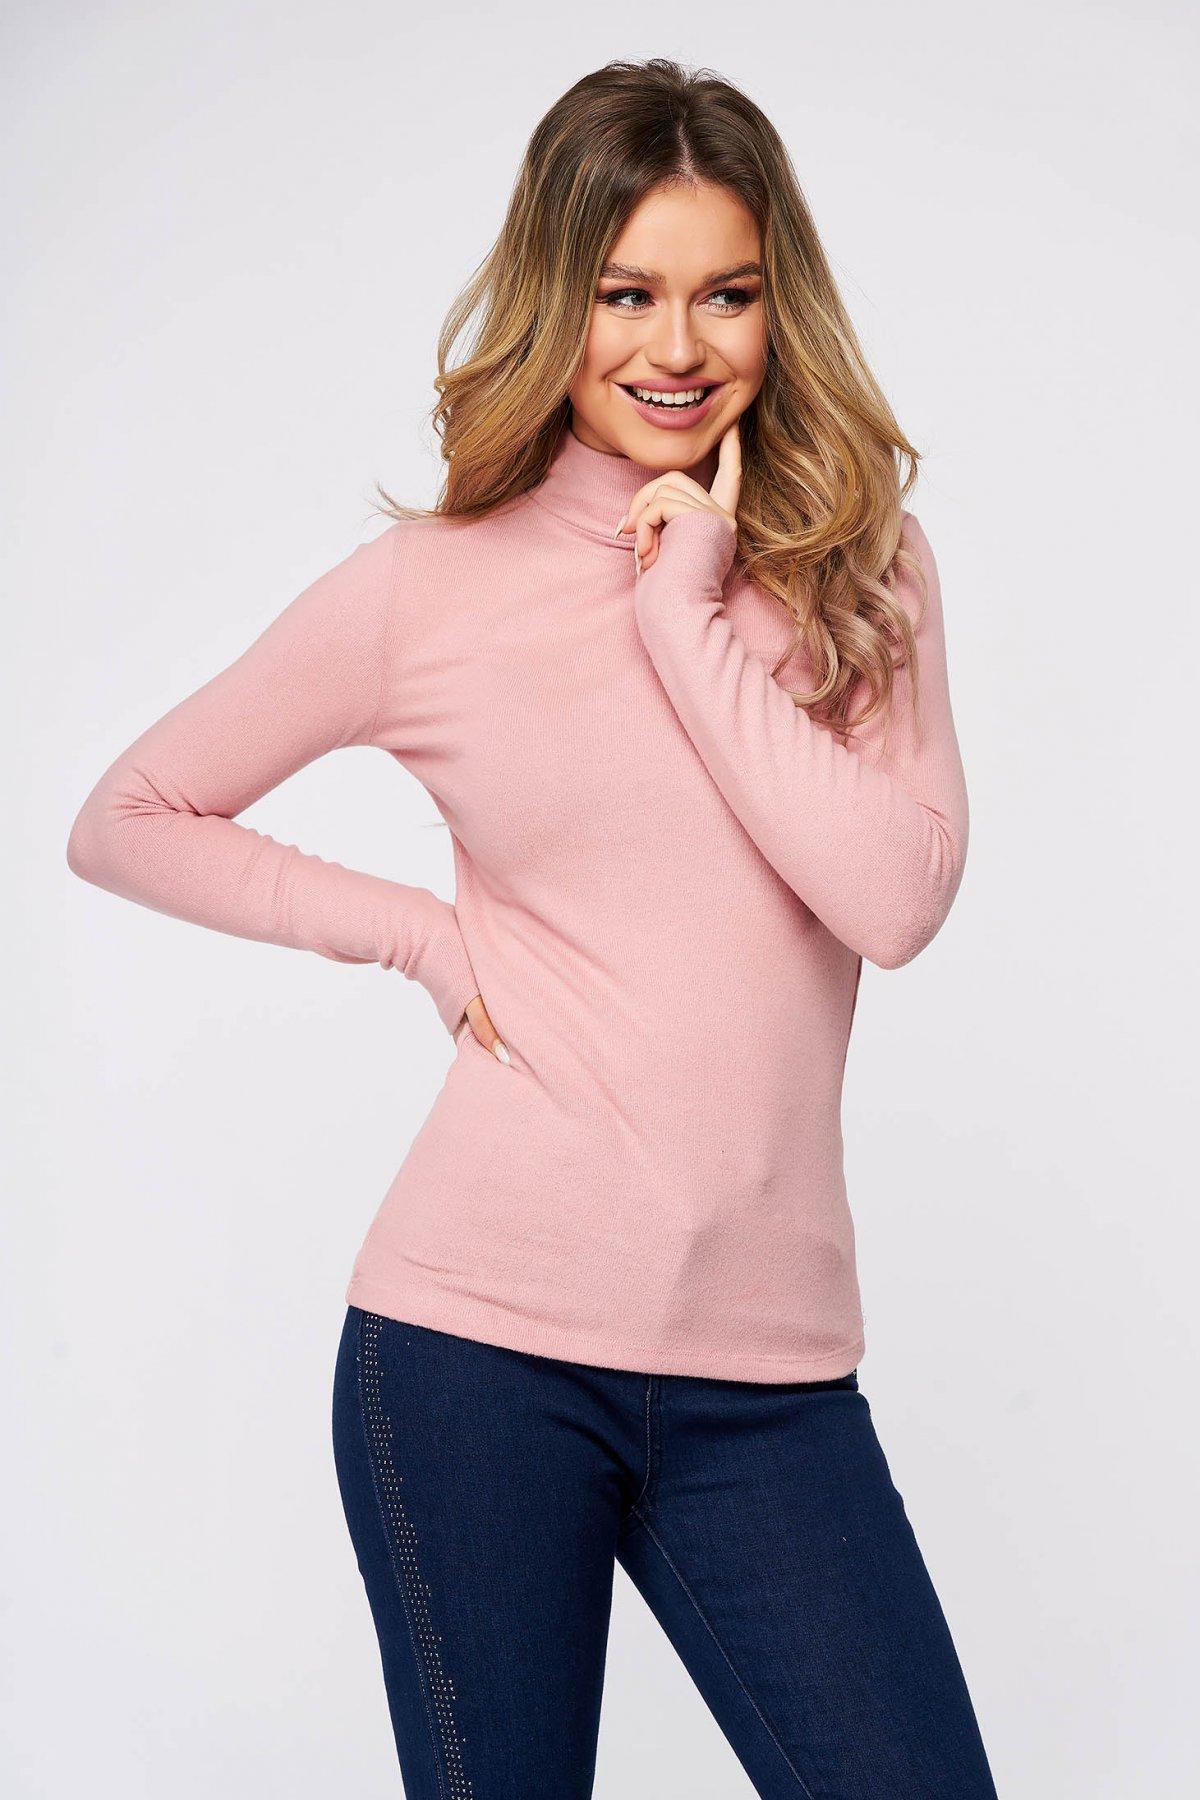 Bluza dama SunShine roz deschis din bumbac pe gat din material elastic si fin la atingere